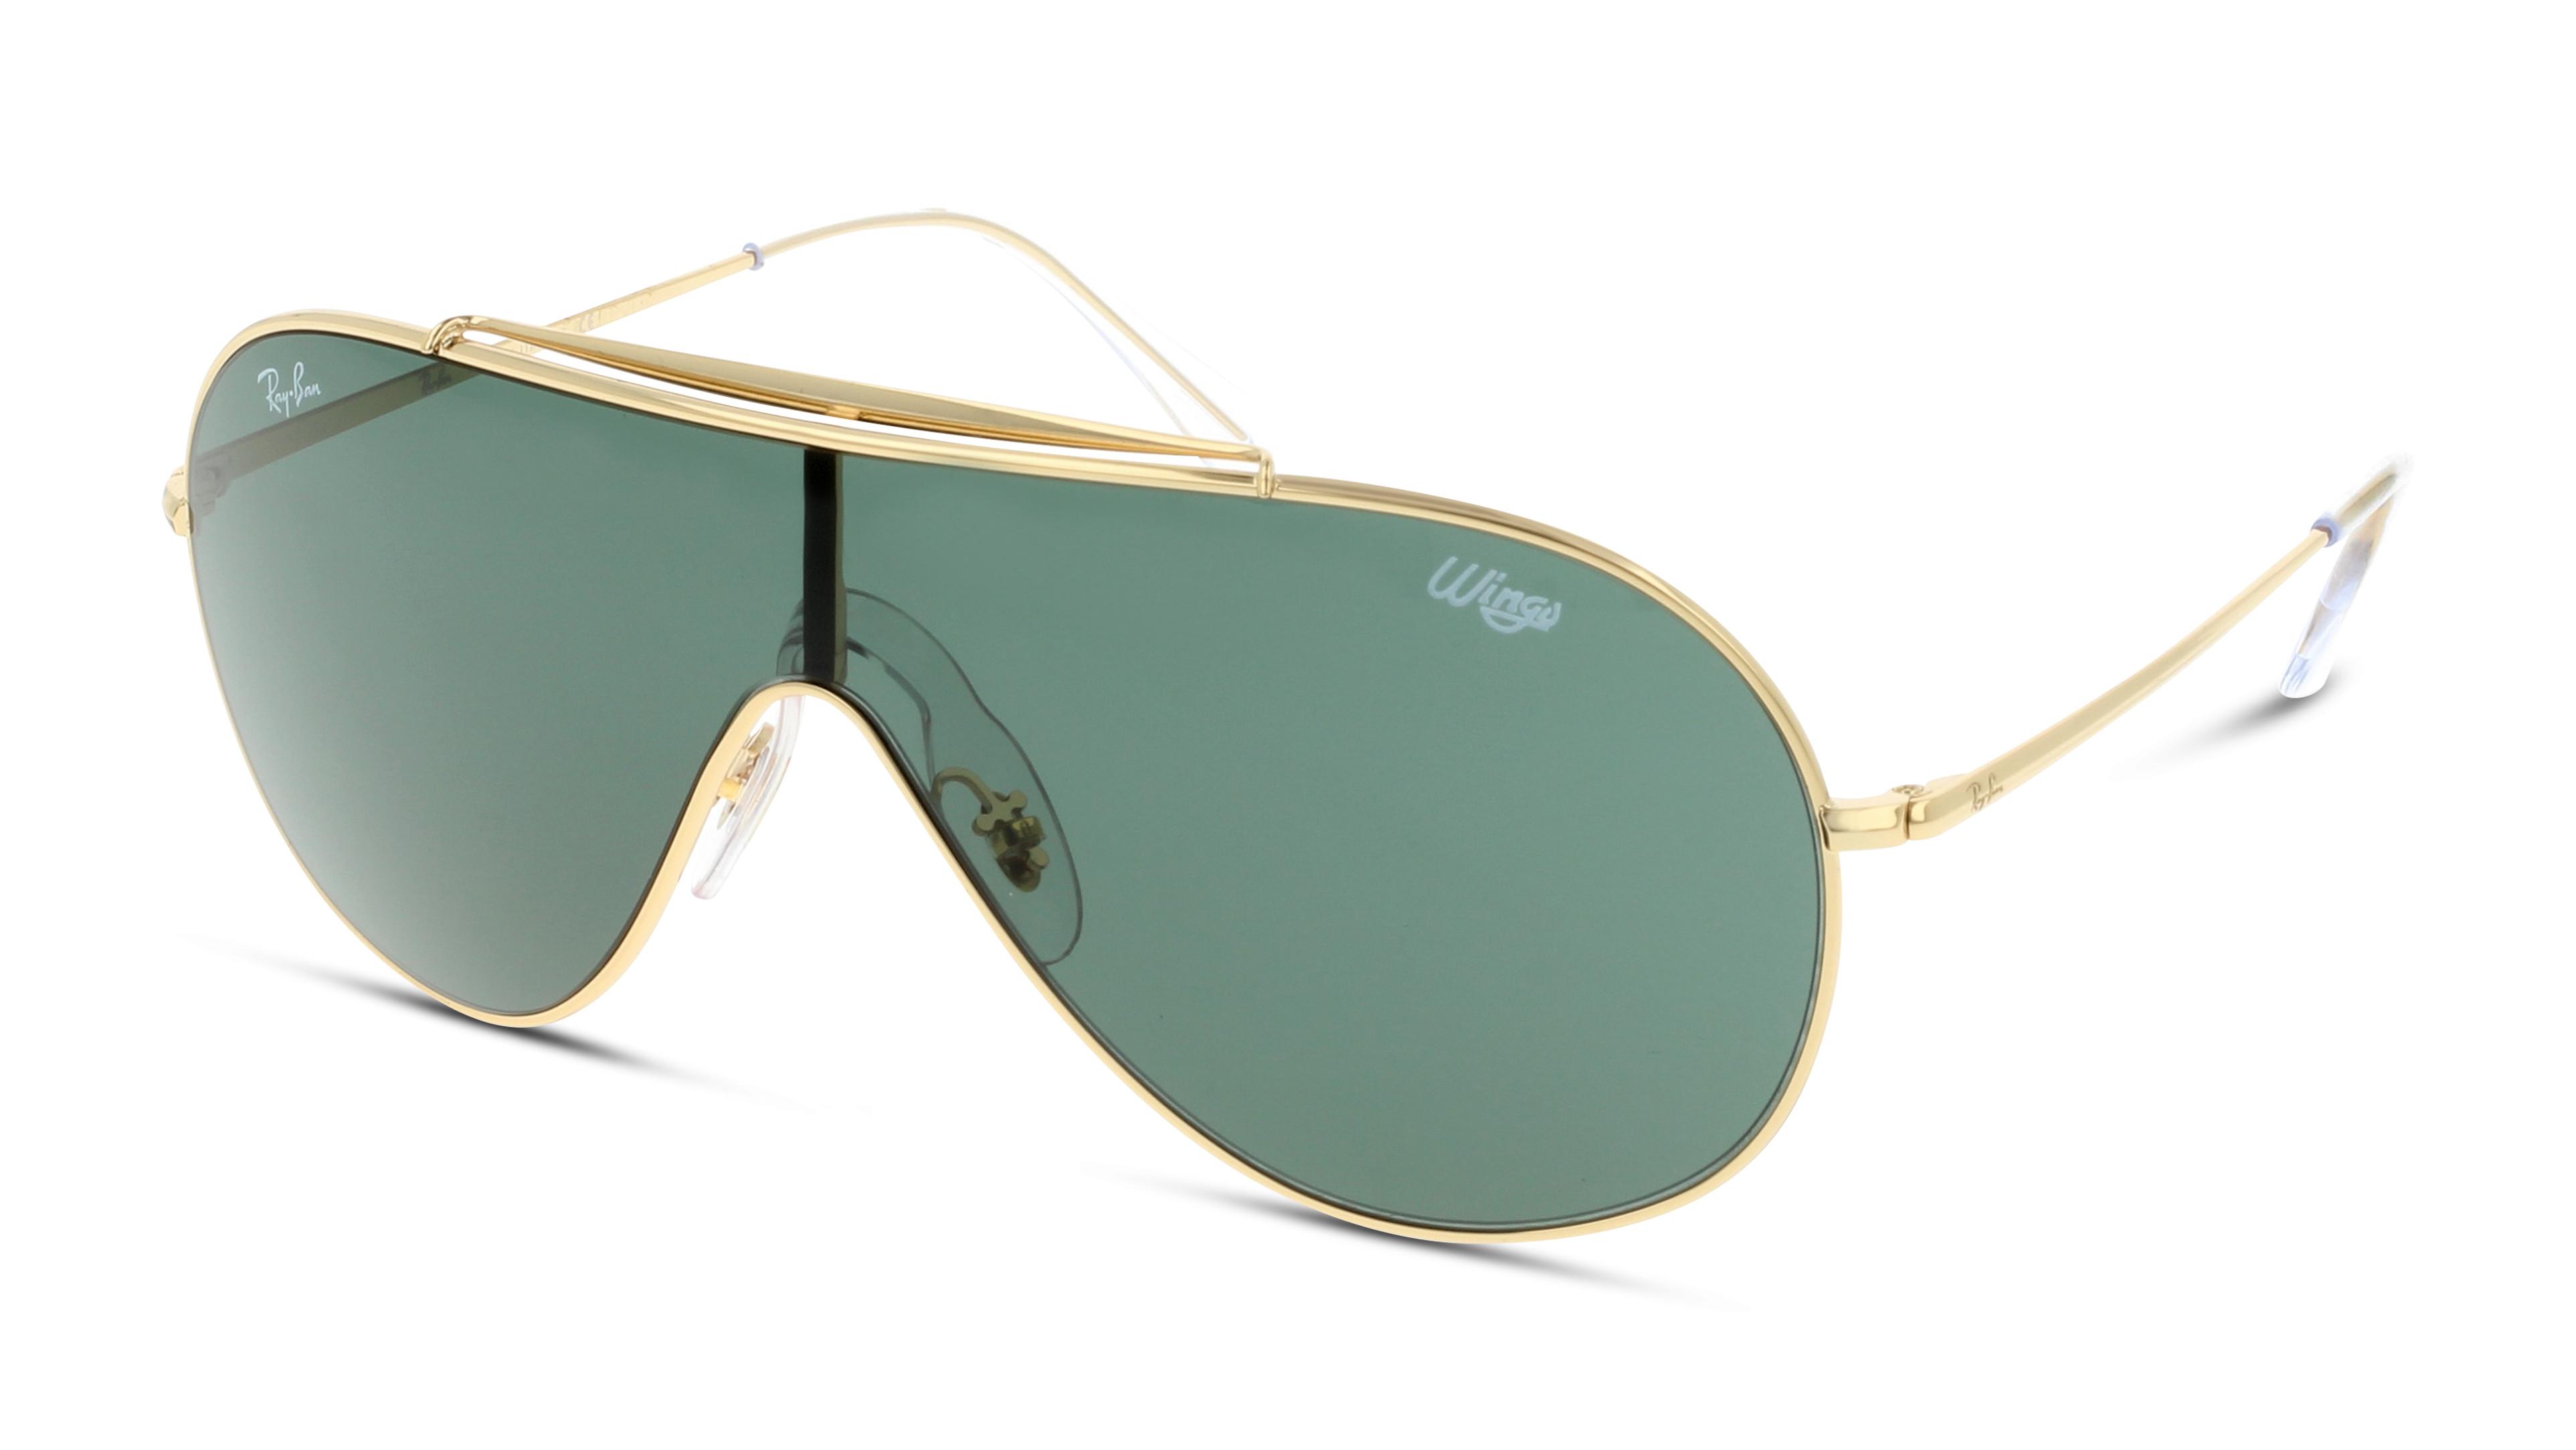 8053672919523-angle-01-rayban-rb3597-eyewear-gold